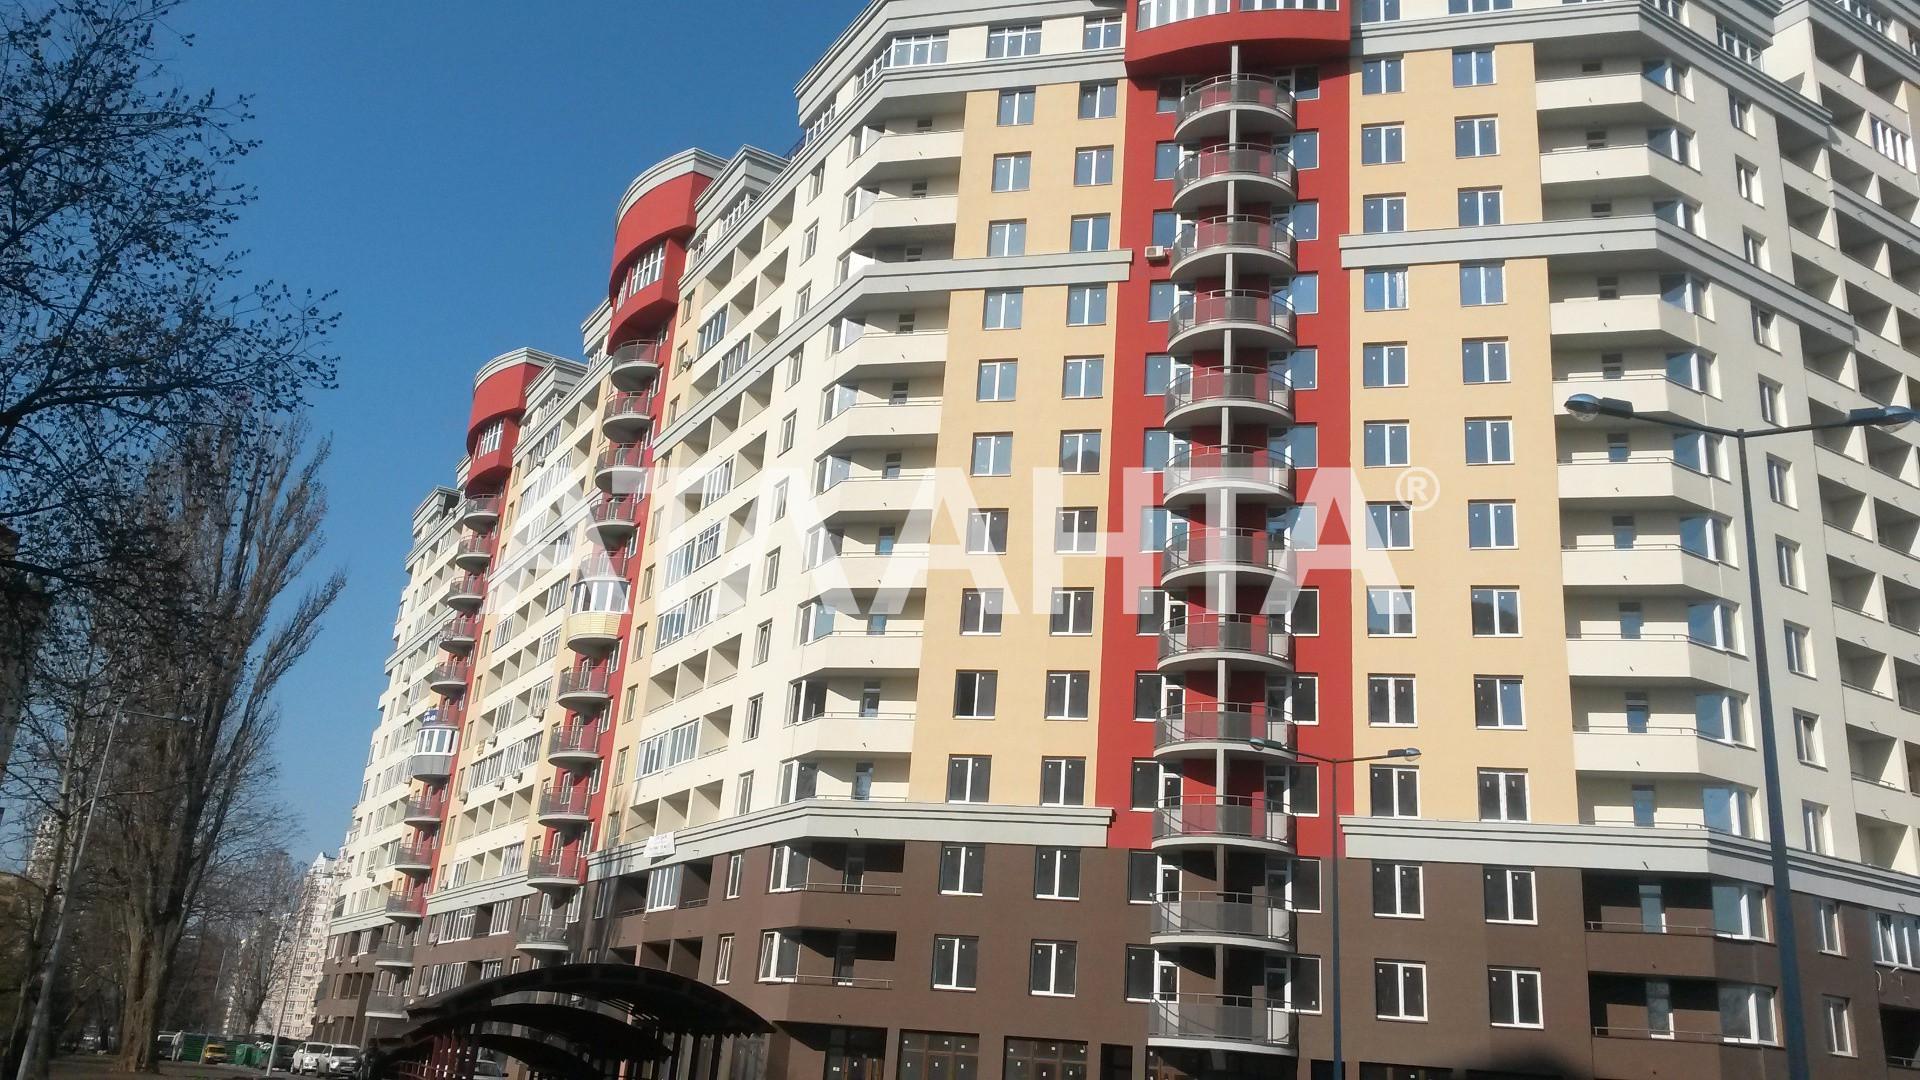 Продается 2-комнатная Квартира на ул. Ломоносова — 65 000 у.е. (фото №13)